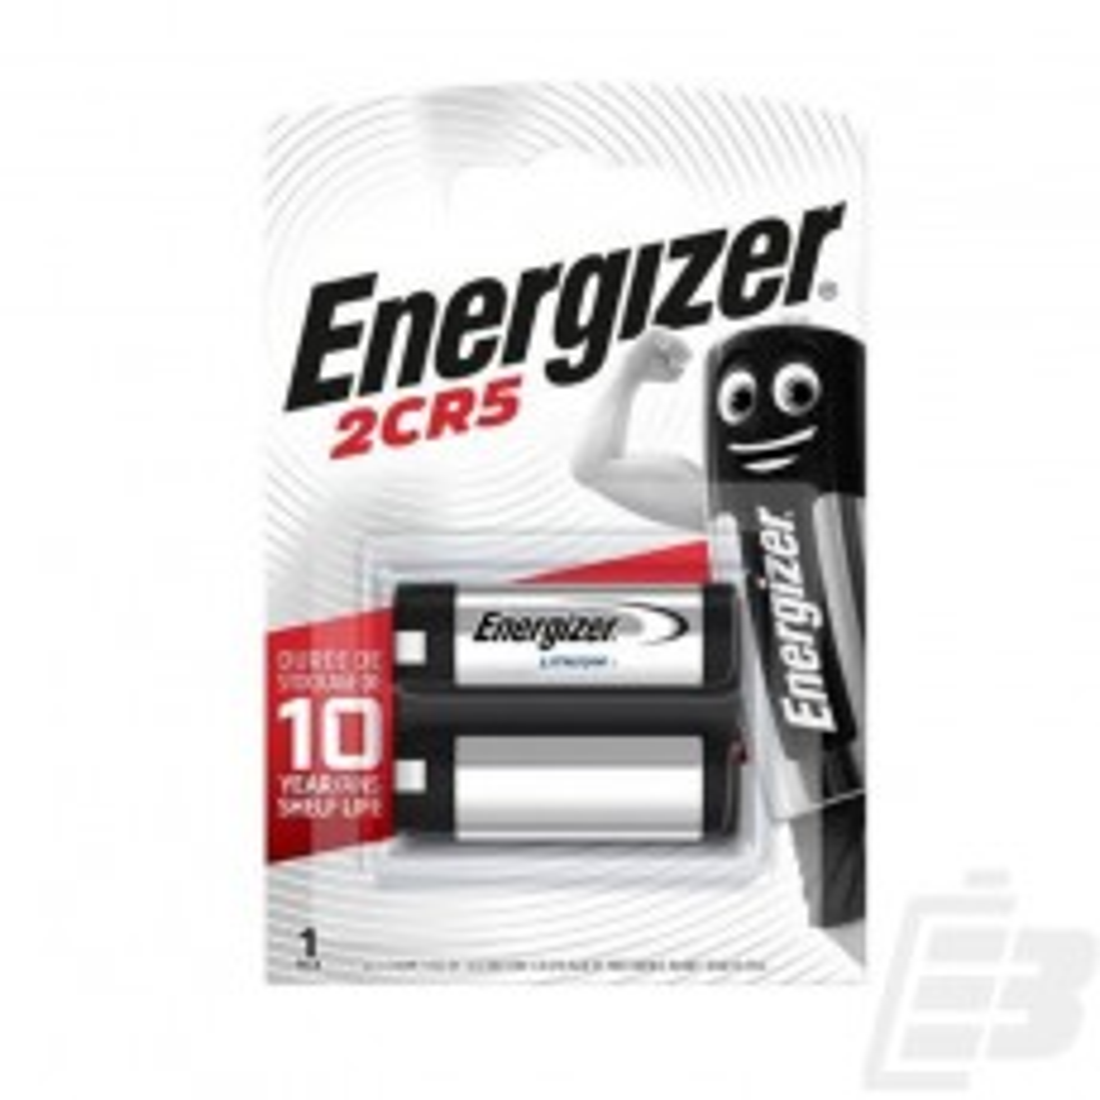 Energizer 2CR5 6V Lithium Battery